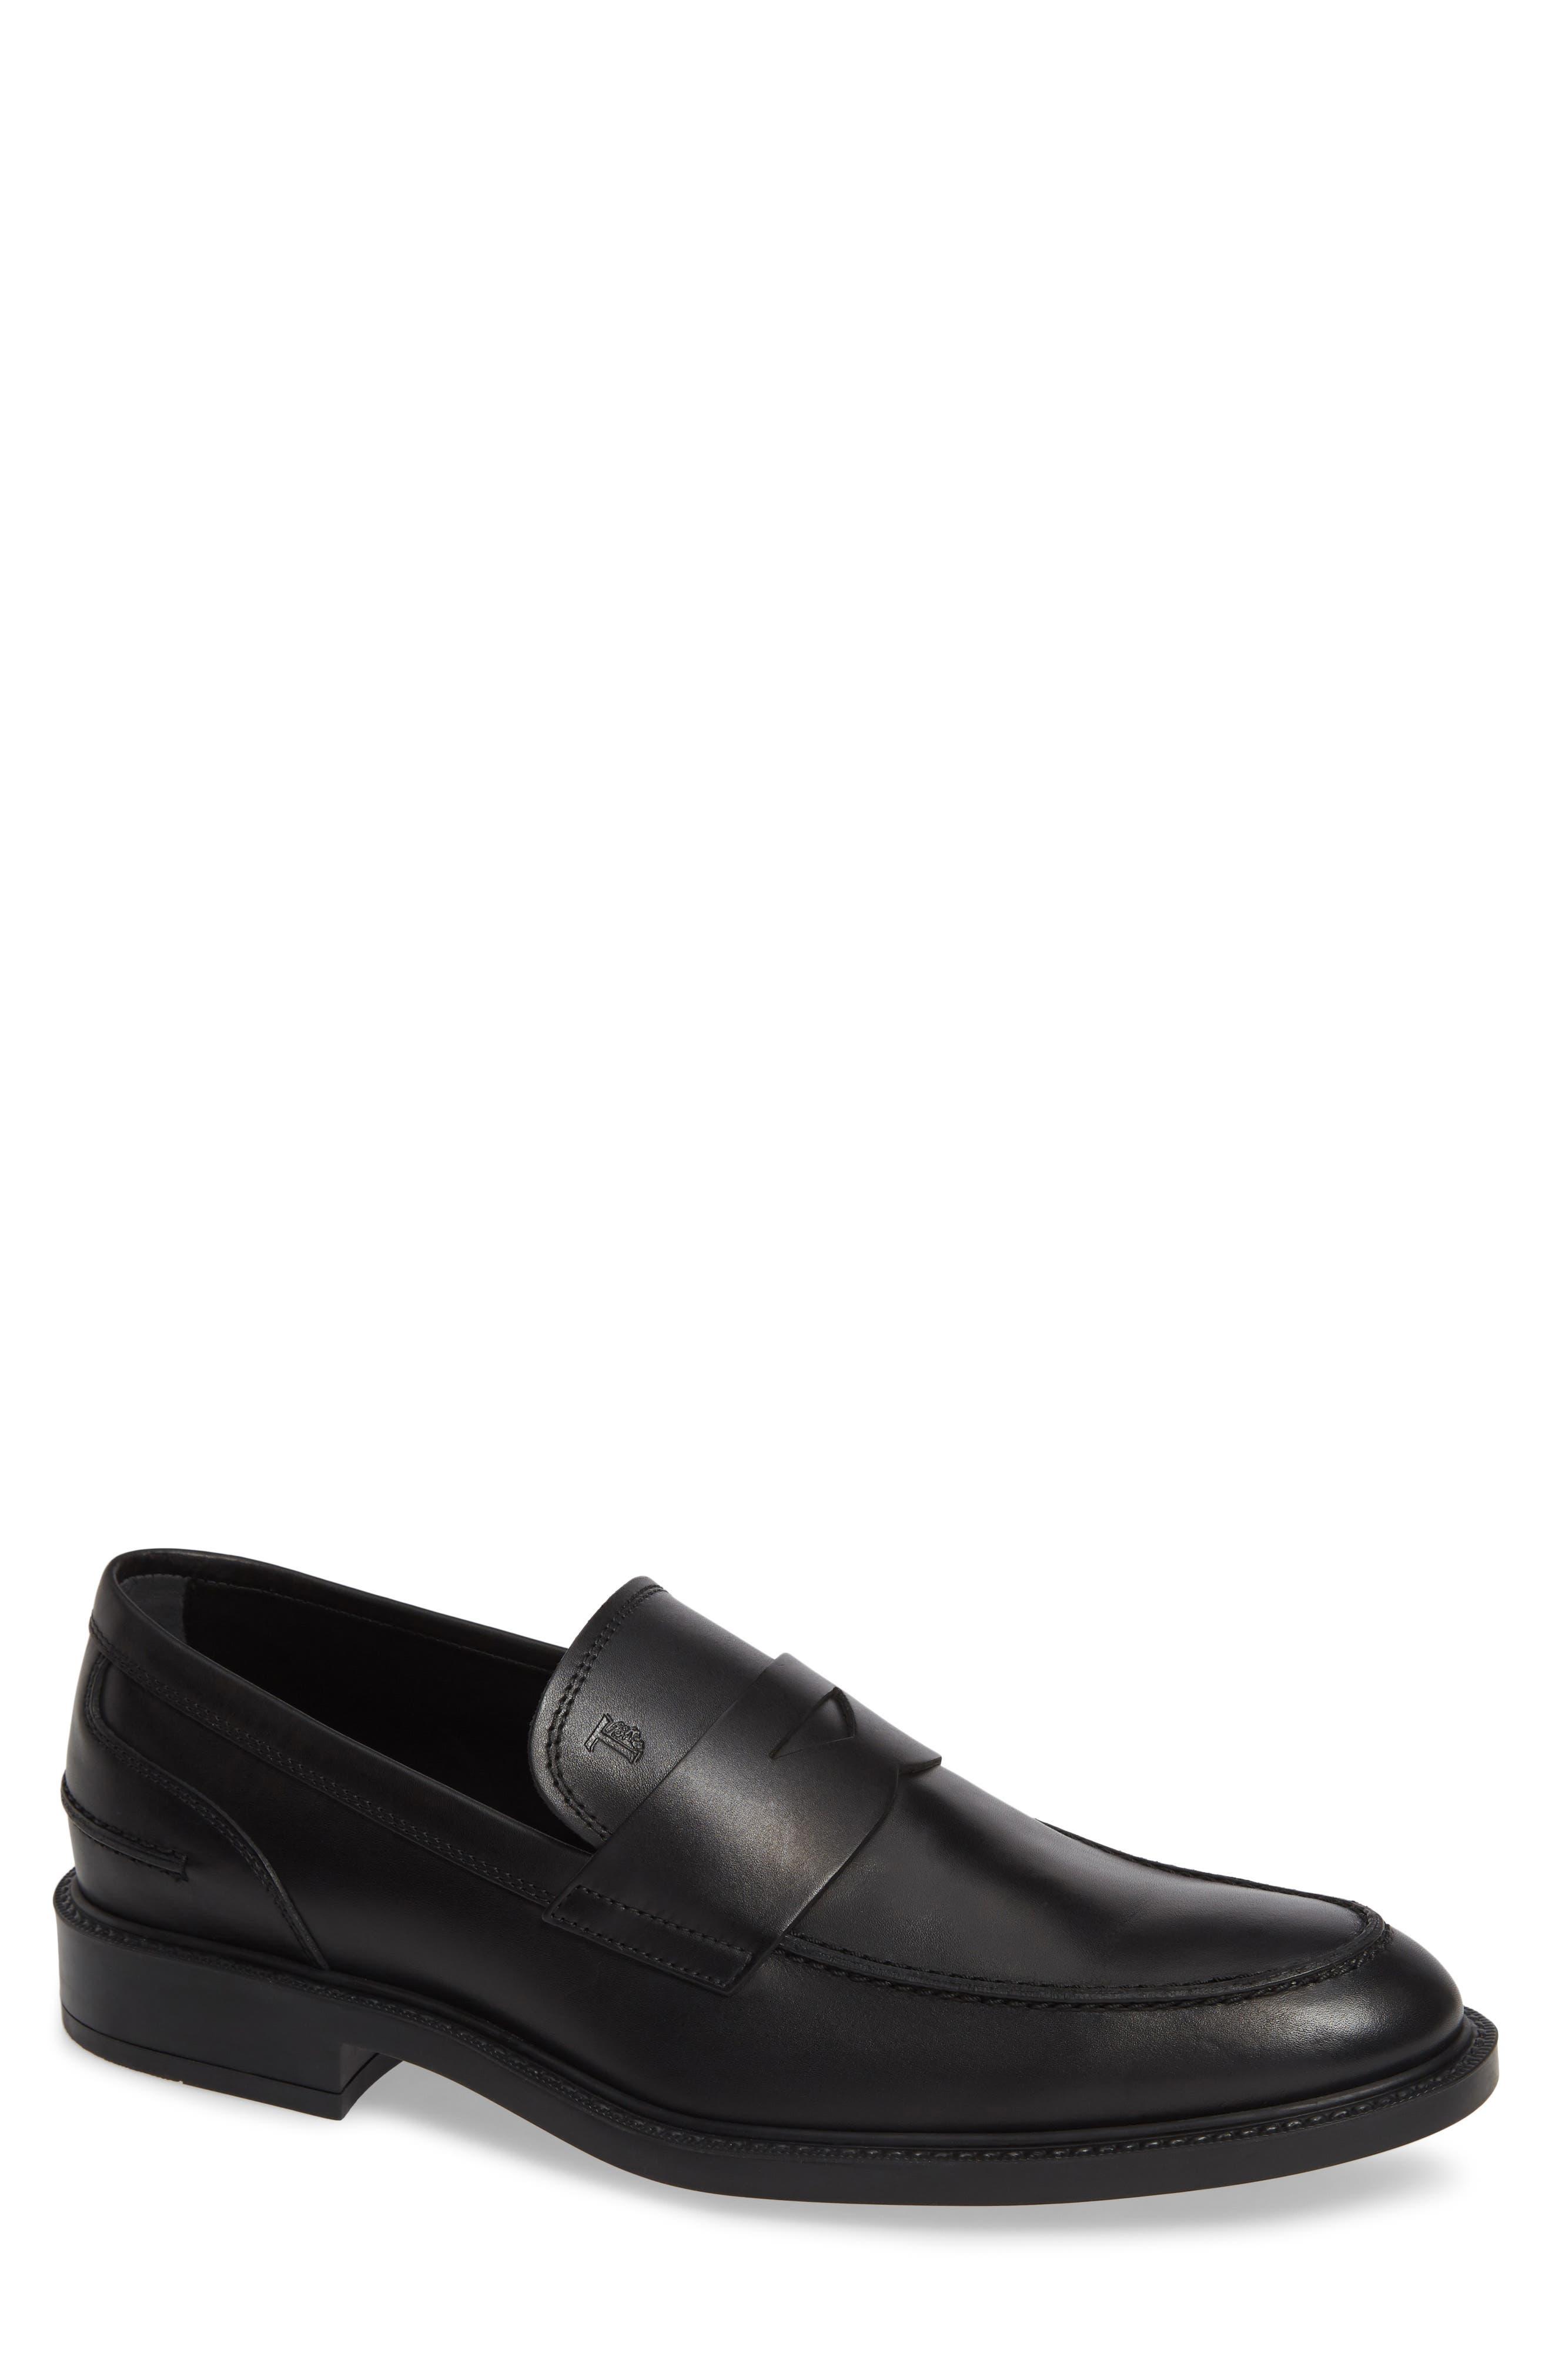 Tod's Damens's & Men's Schuhes     Nordstrom d6339b